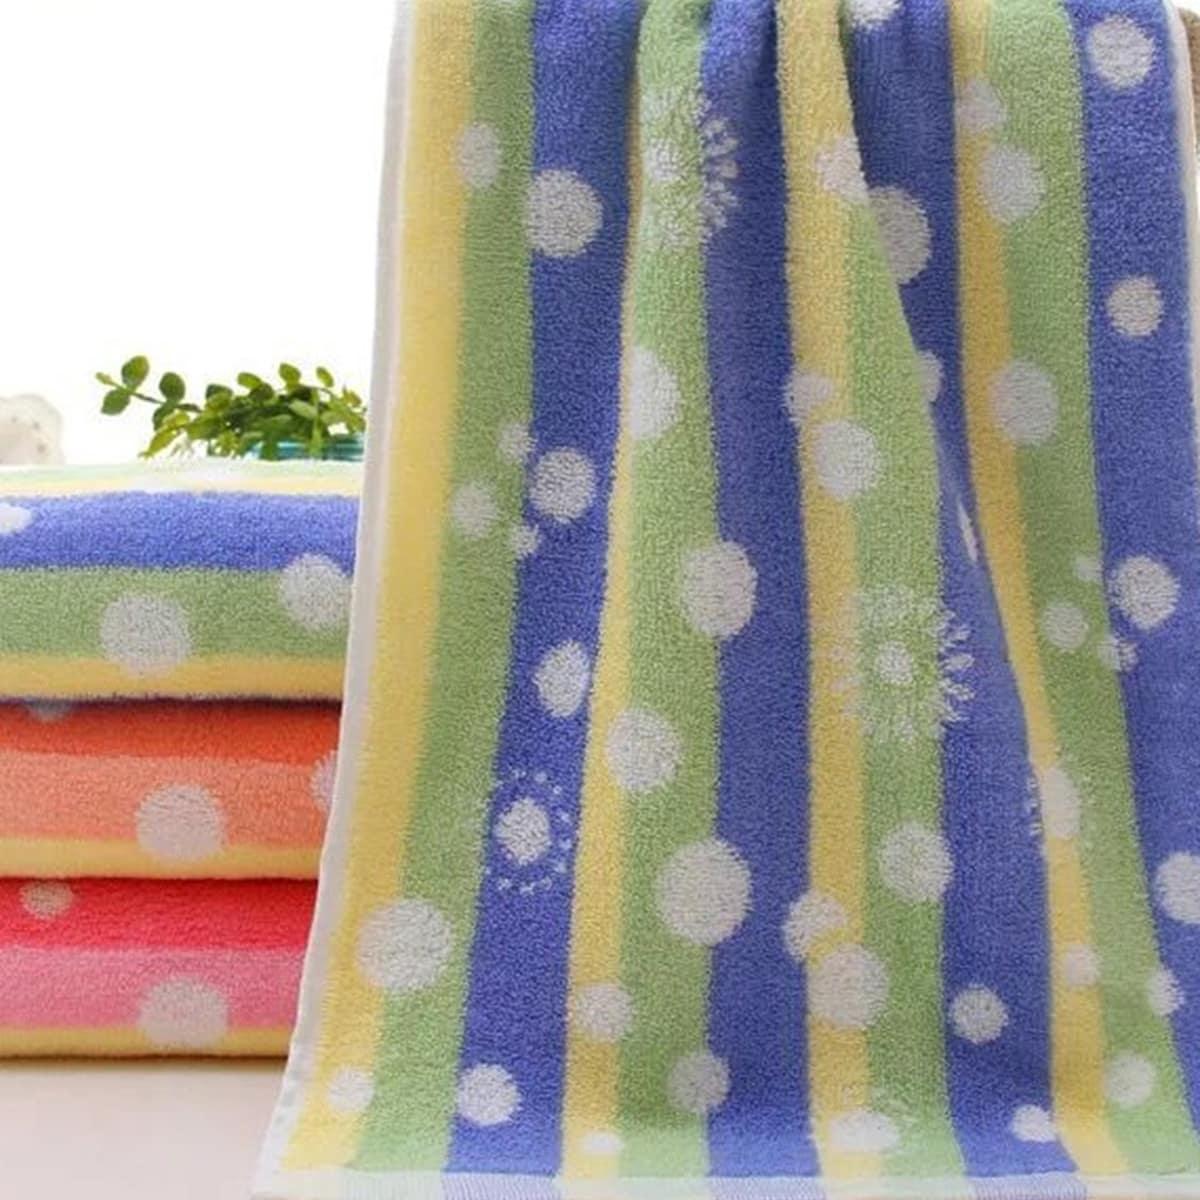 1-delige handdoek met streep- en puntpatroon